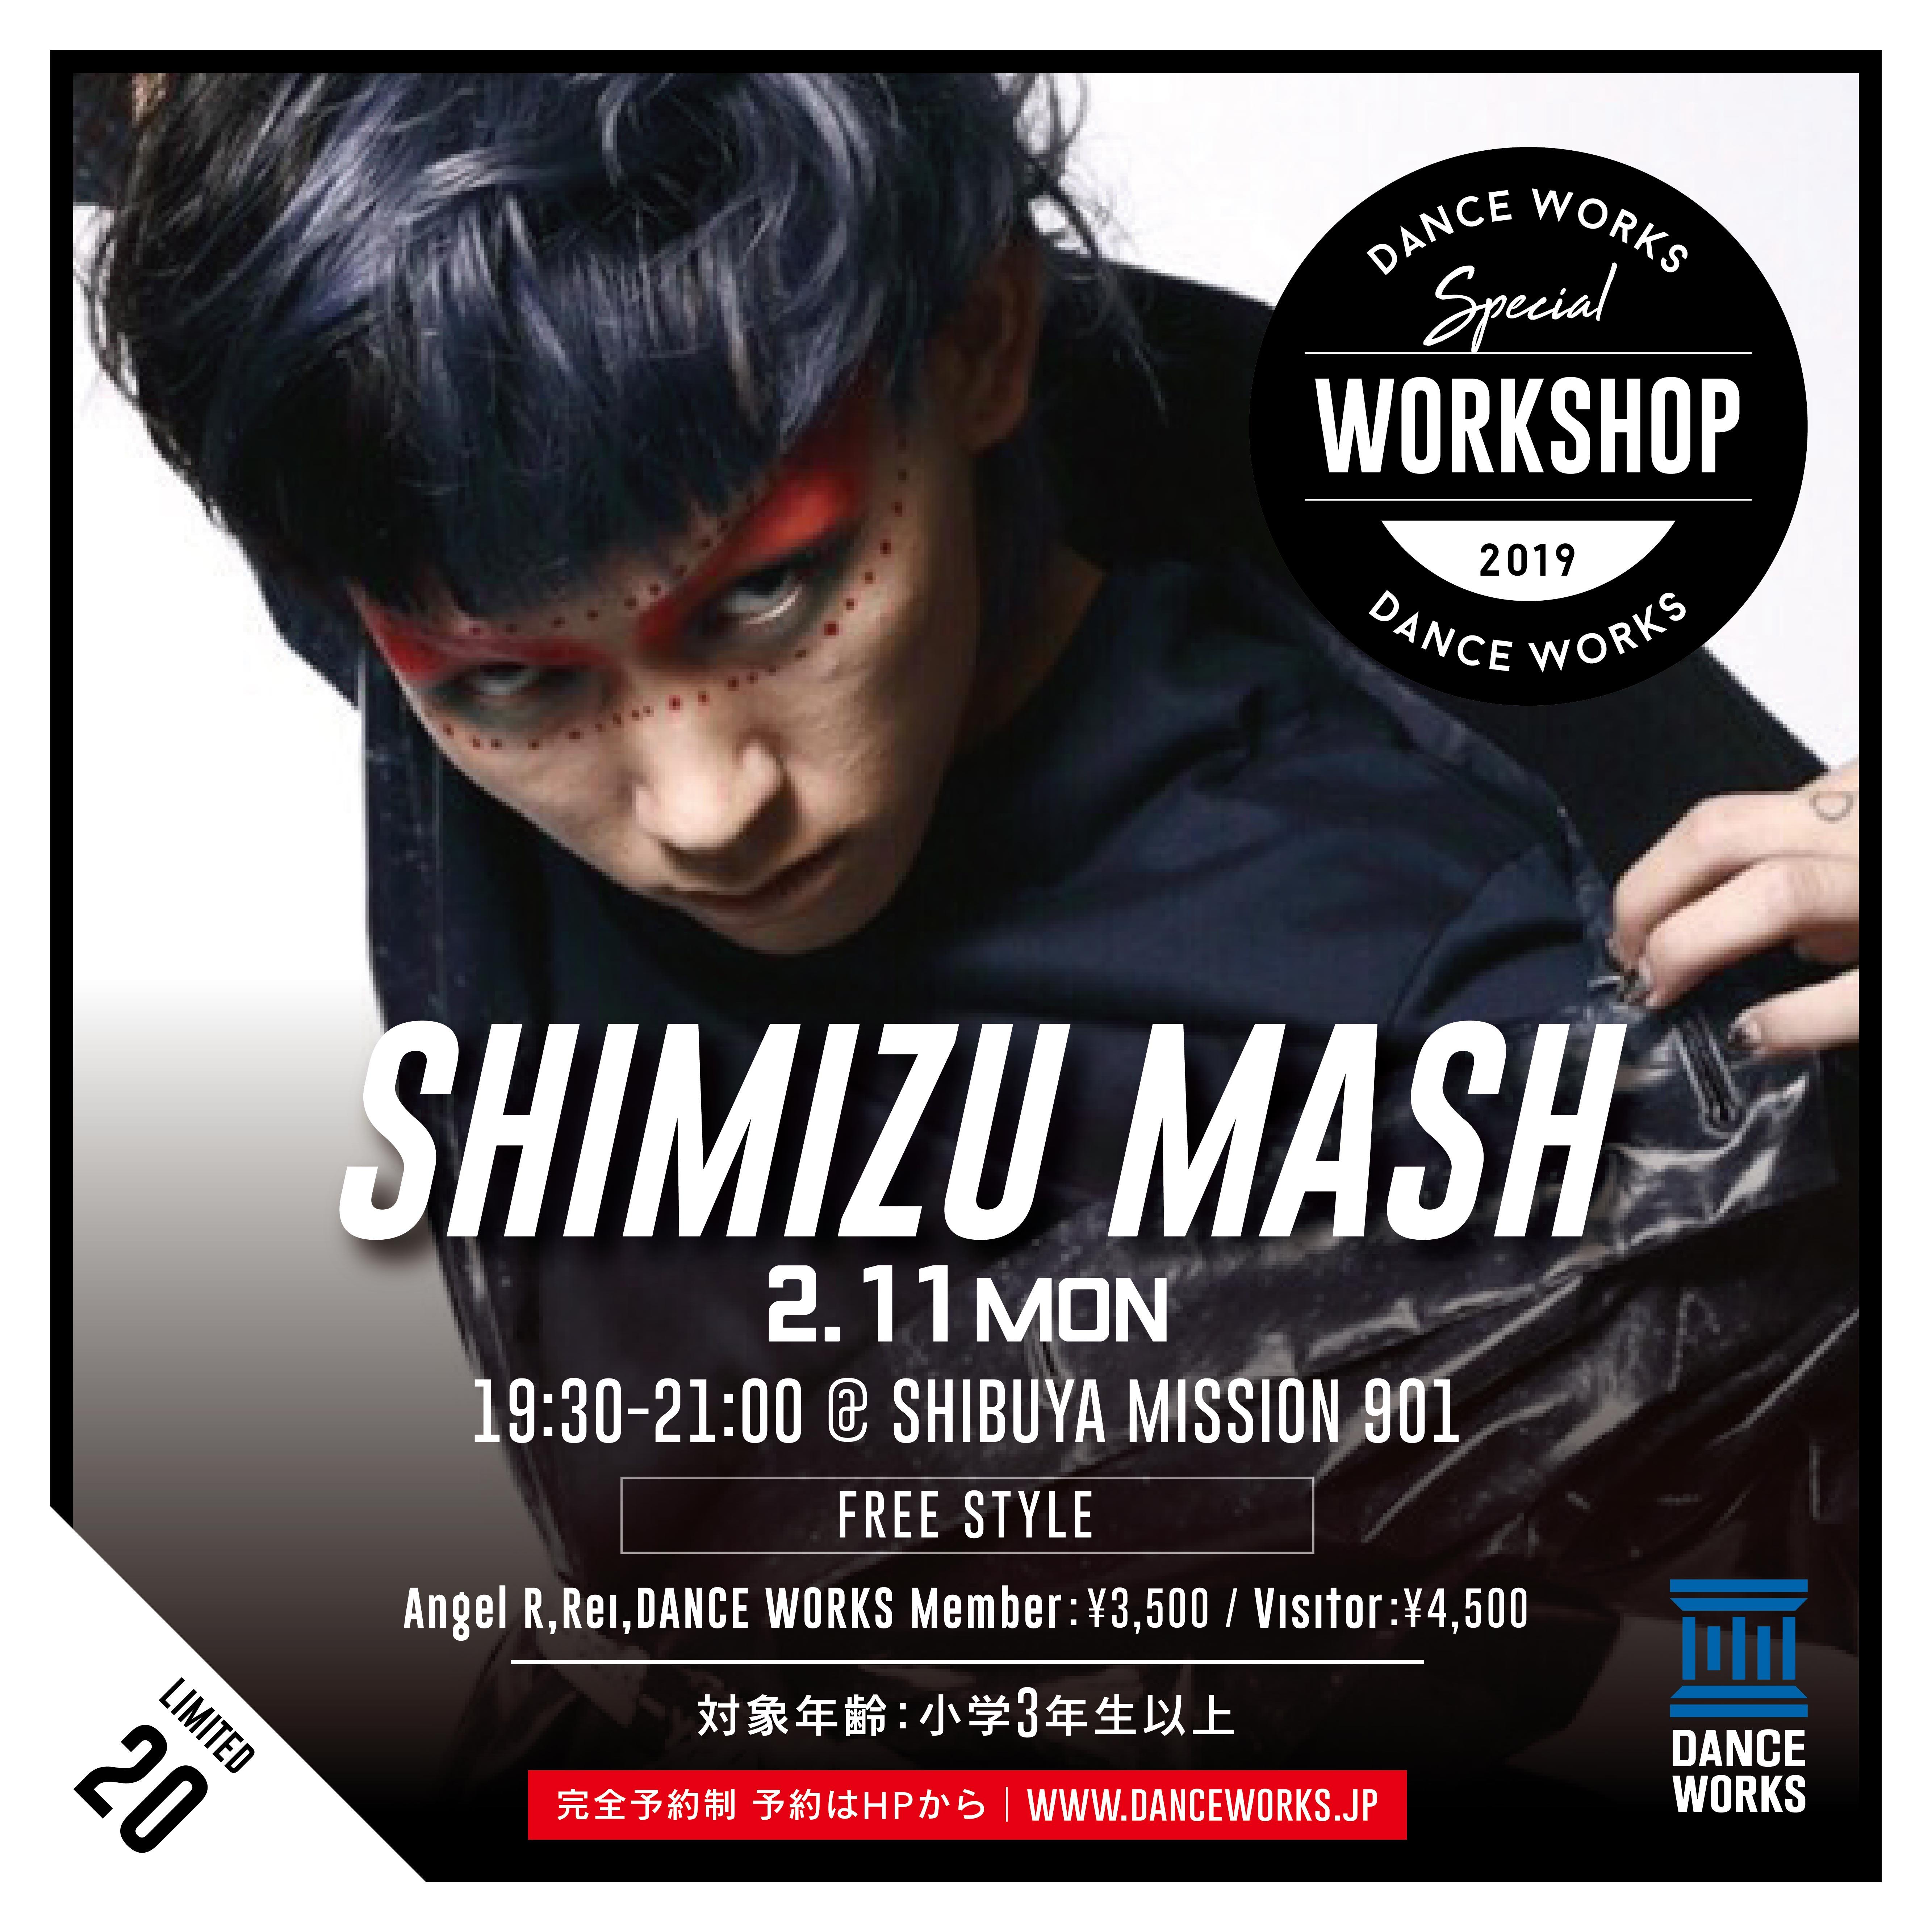 SHIMIZUMASH_POP-02